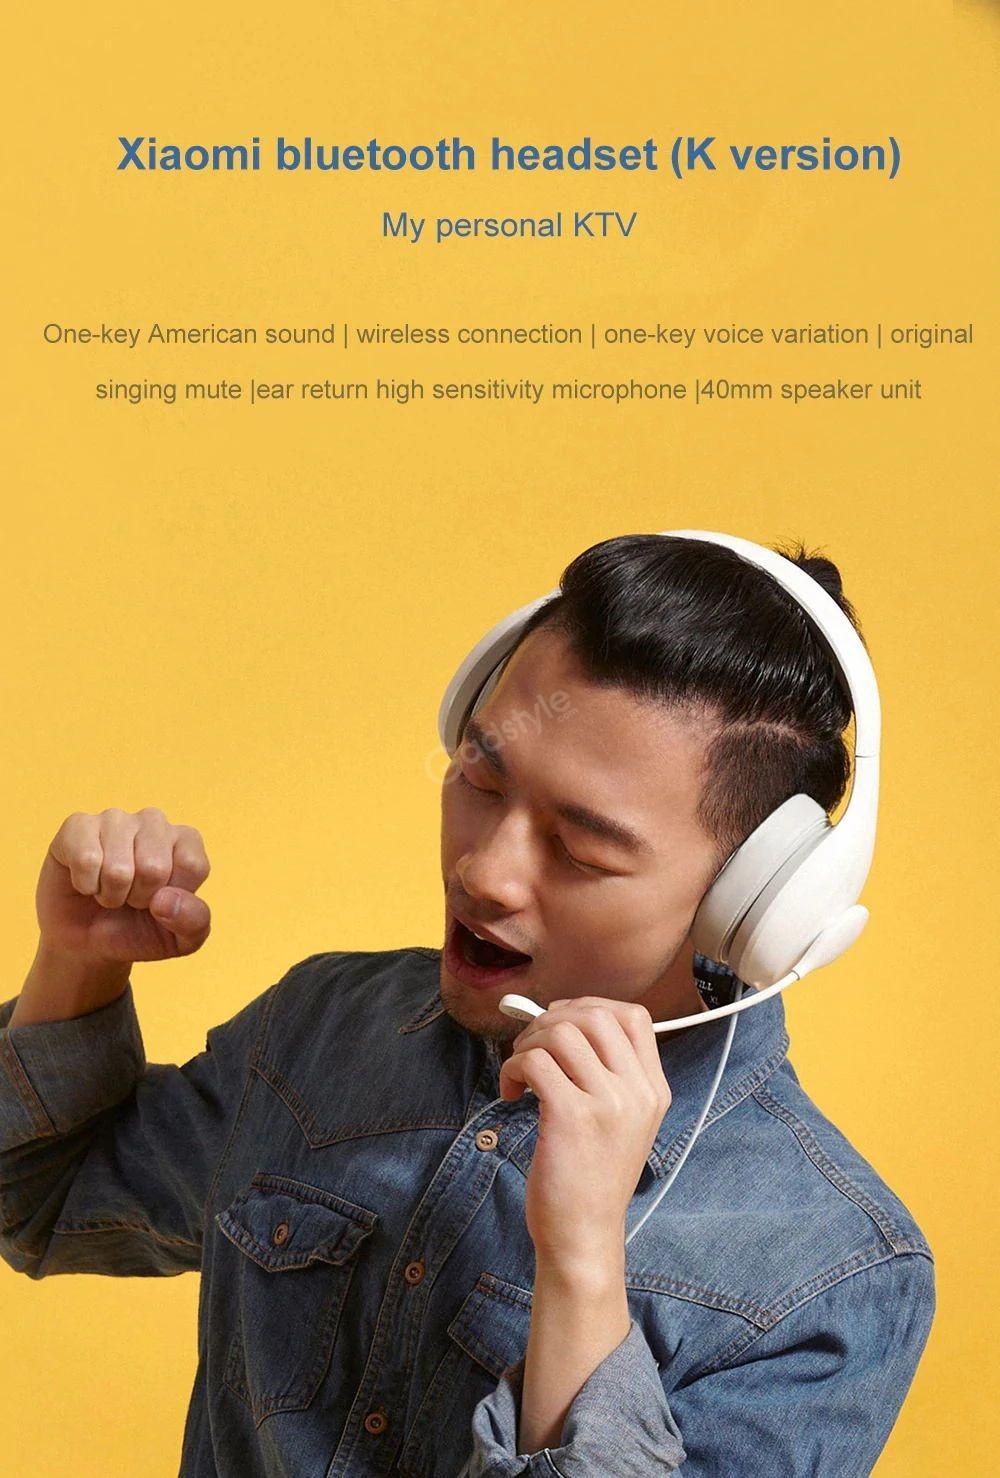 Xiaomi Ndz 18 Ai 40mm Speaker Wired Headphone With Microphone (3)